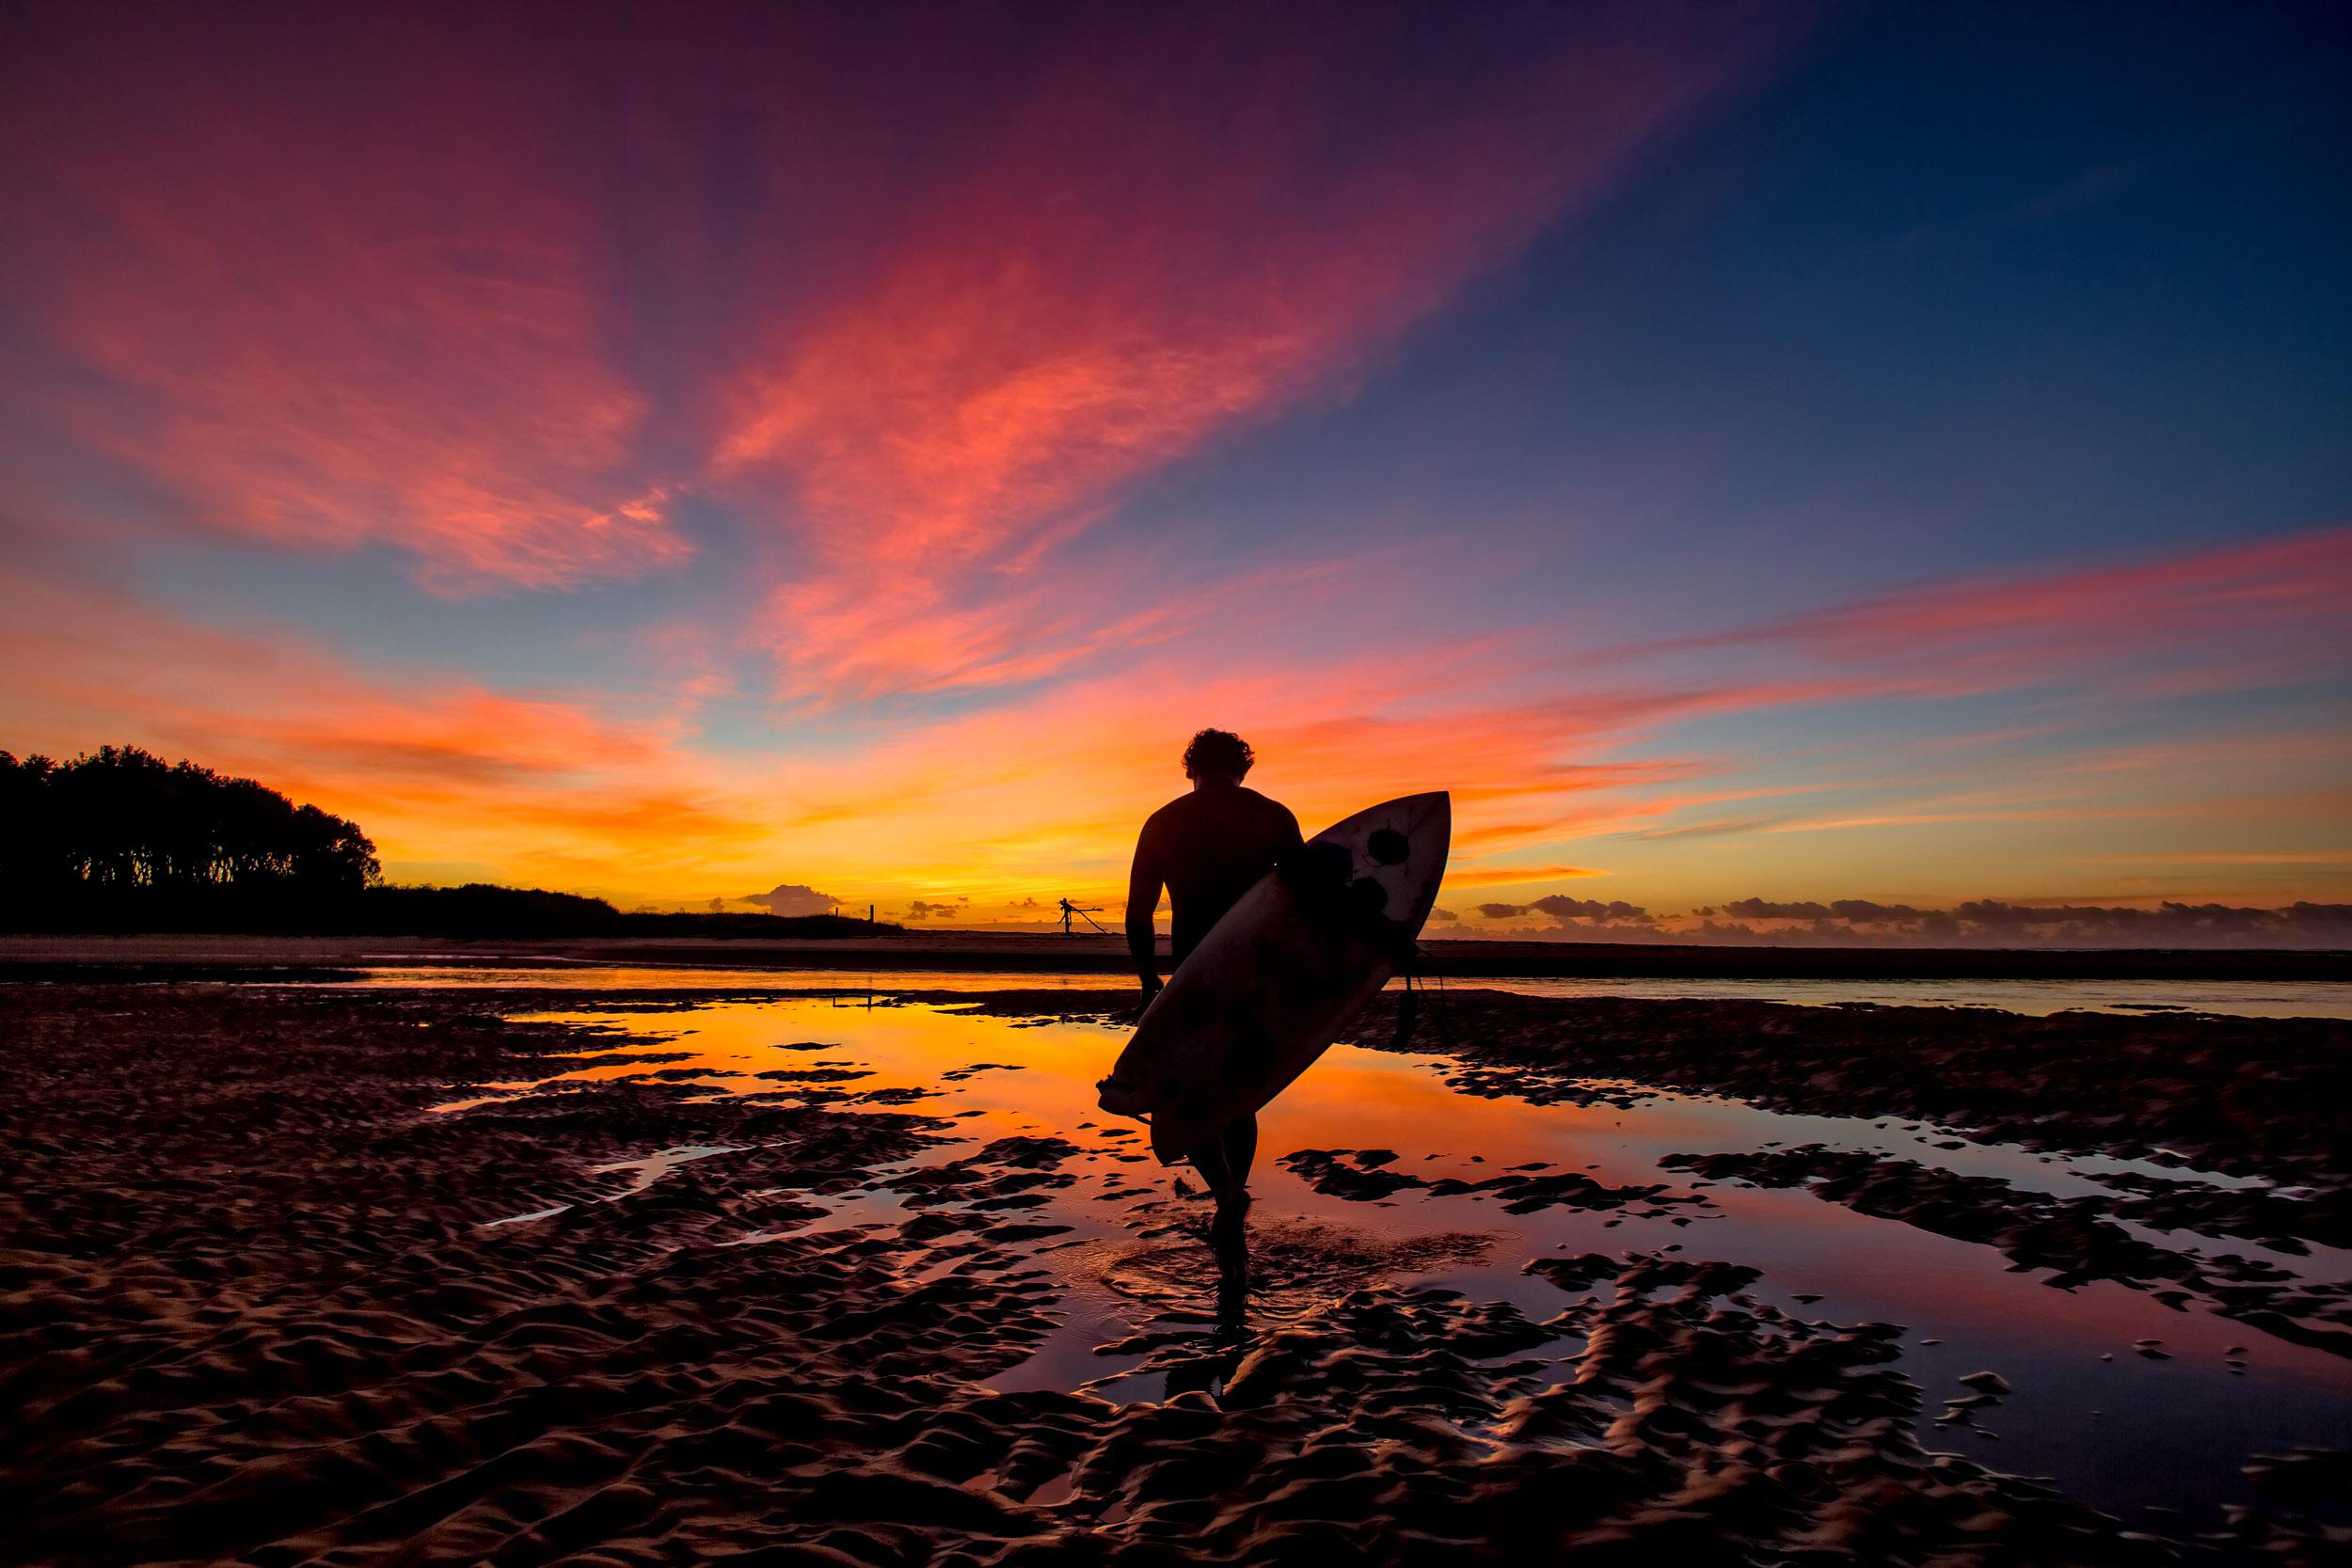 sunrise-surfer-moonee-beach-copyright.jpg